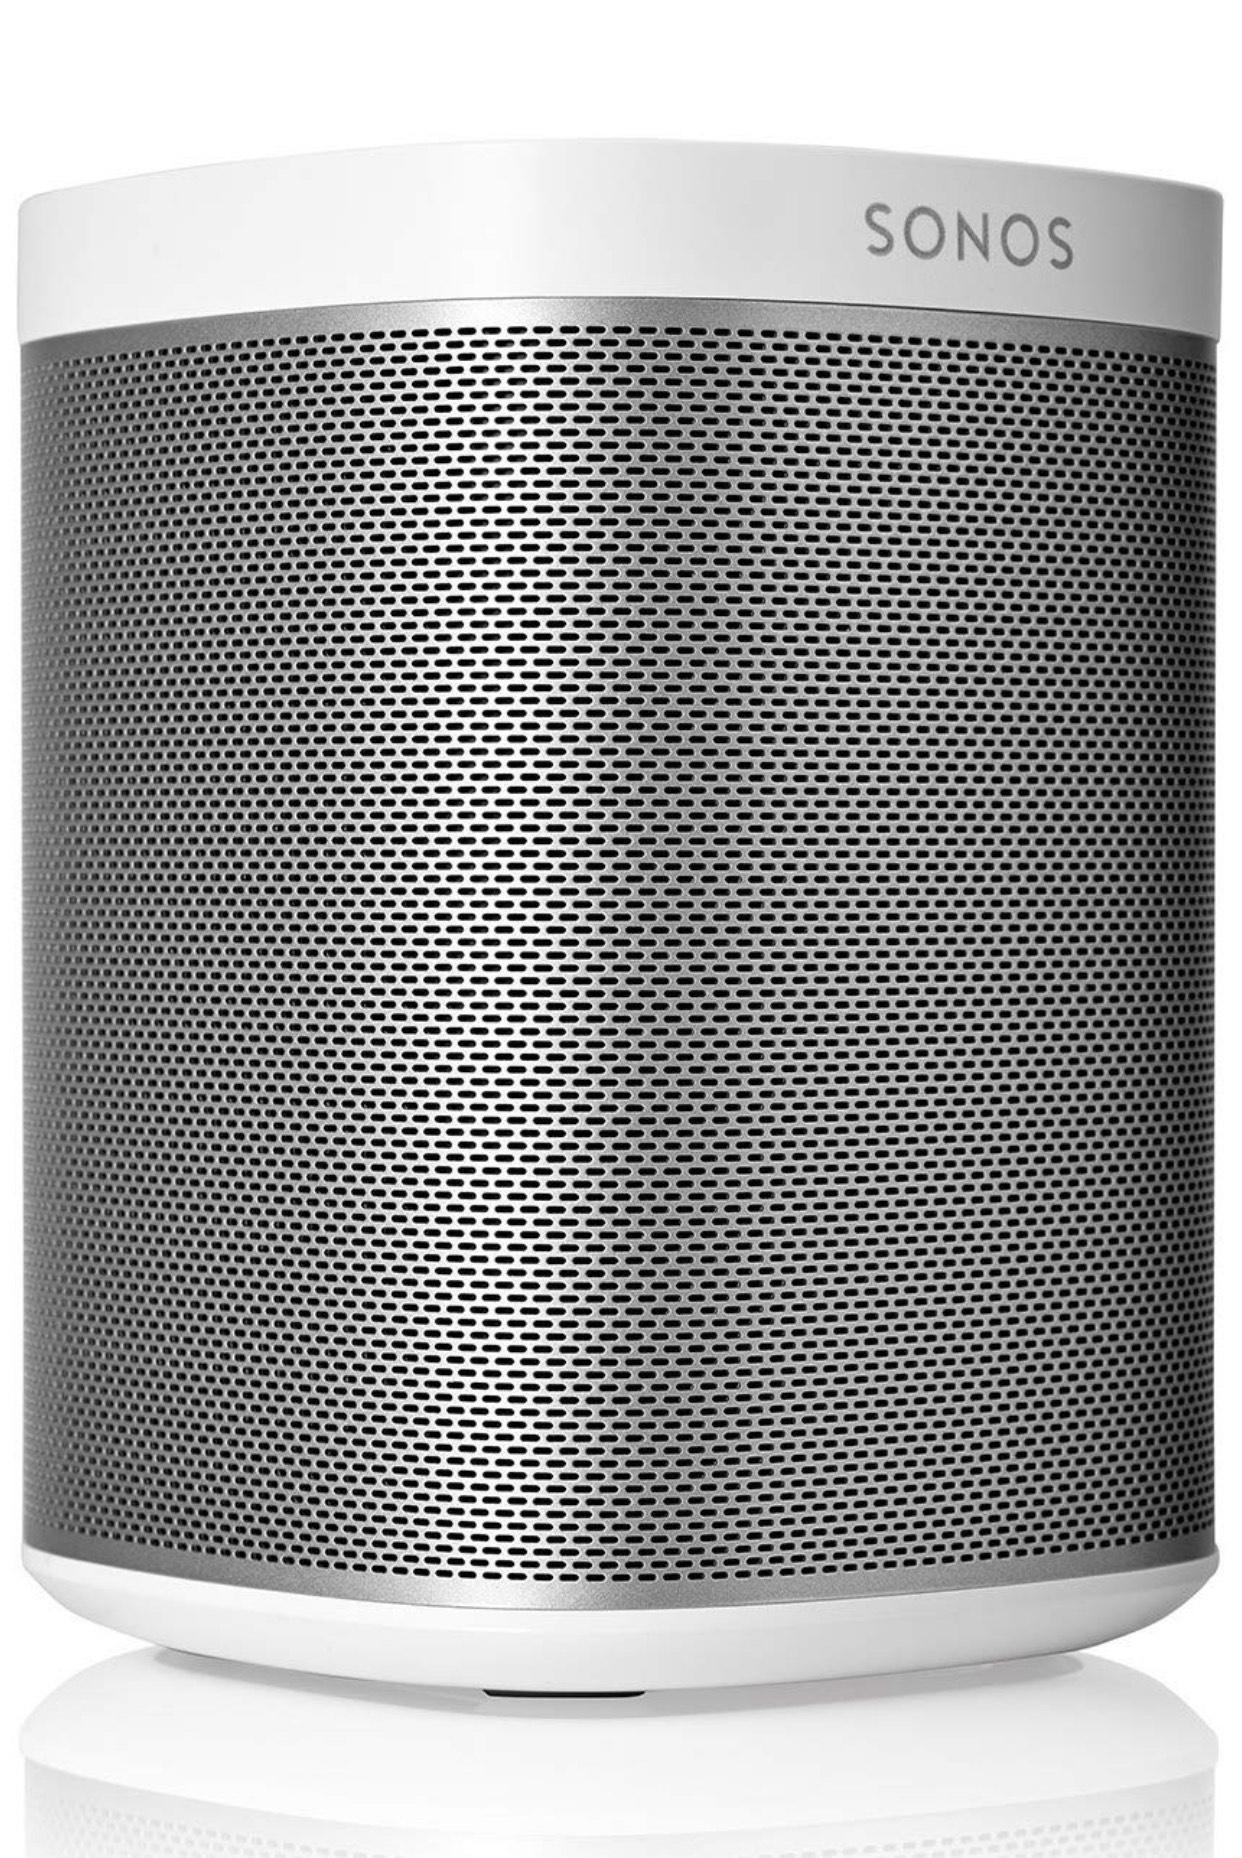 Enceinte Wi-Fi Sonos Play:1 - Blanc ou Noir